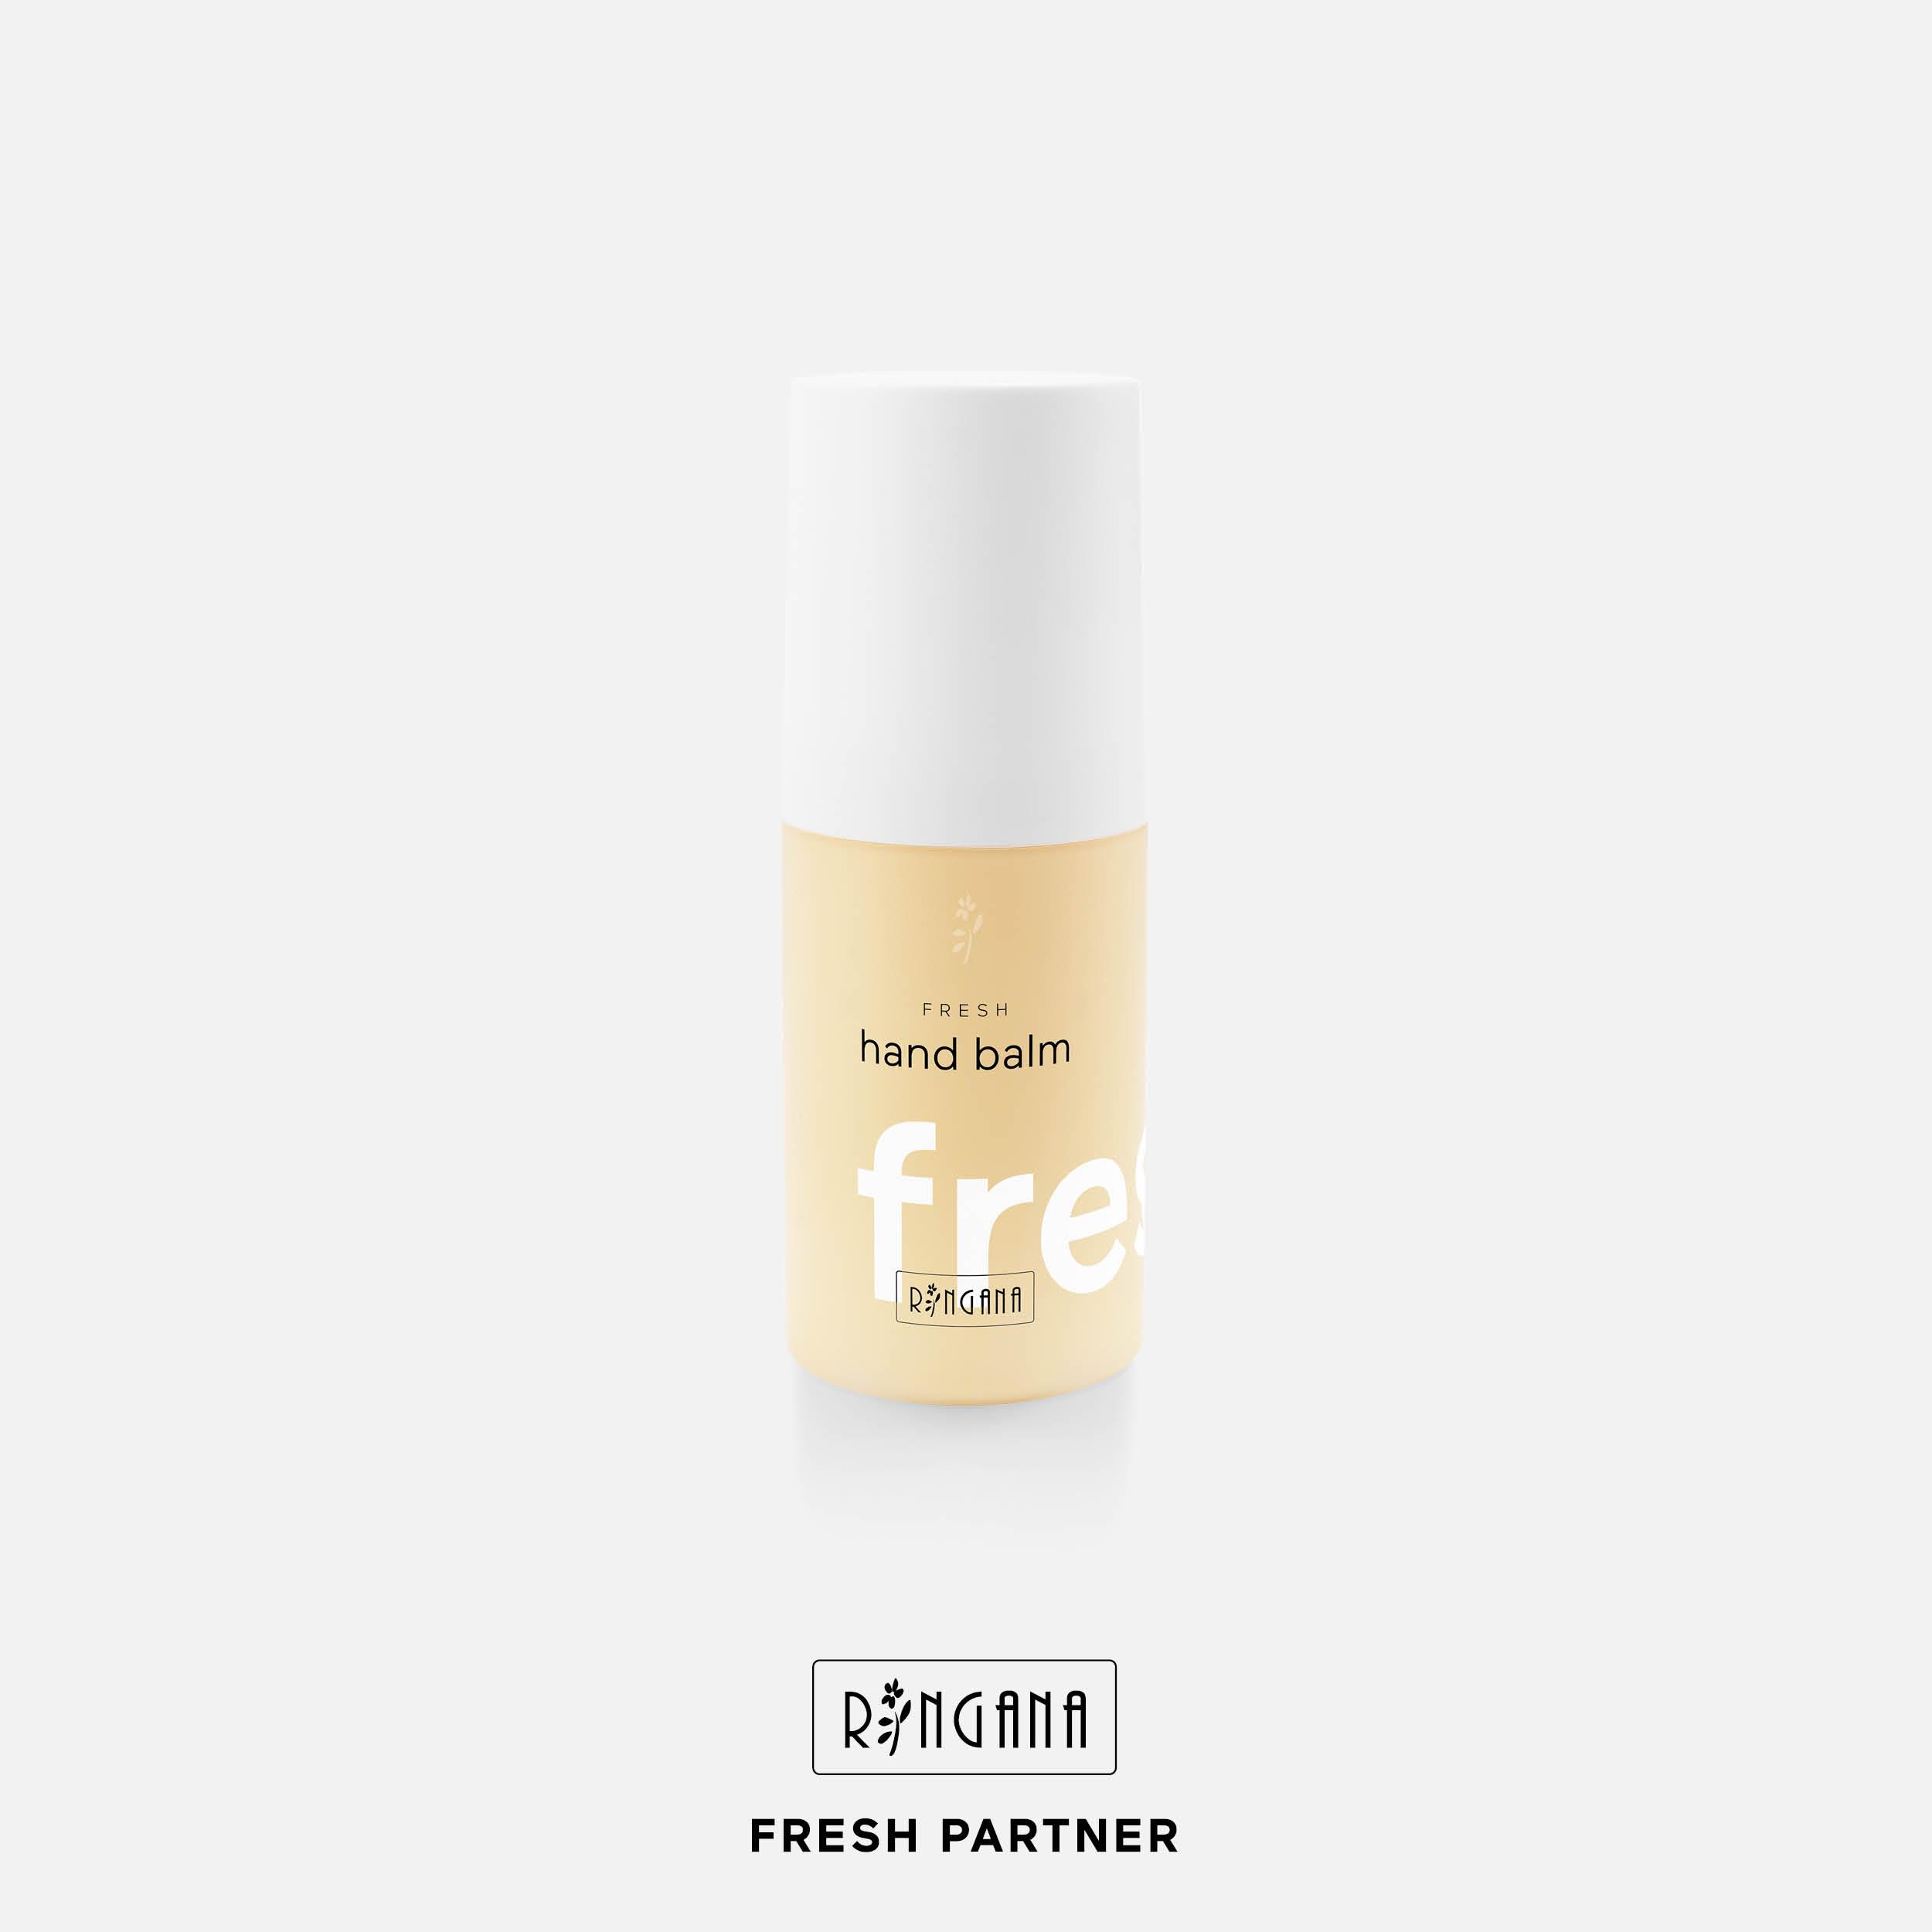 Ringana FRESH hand balm – Unsere beste hand creme: Natur Kosmetik!